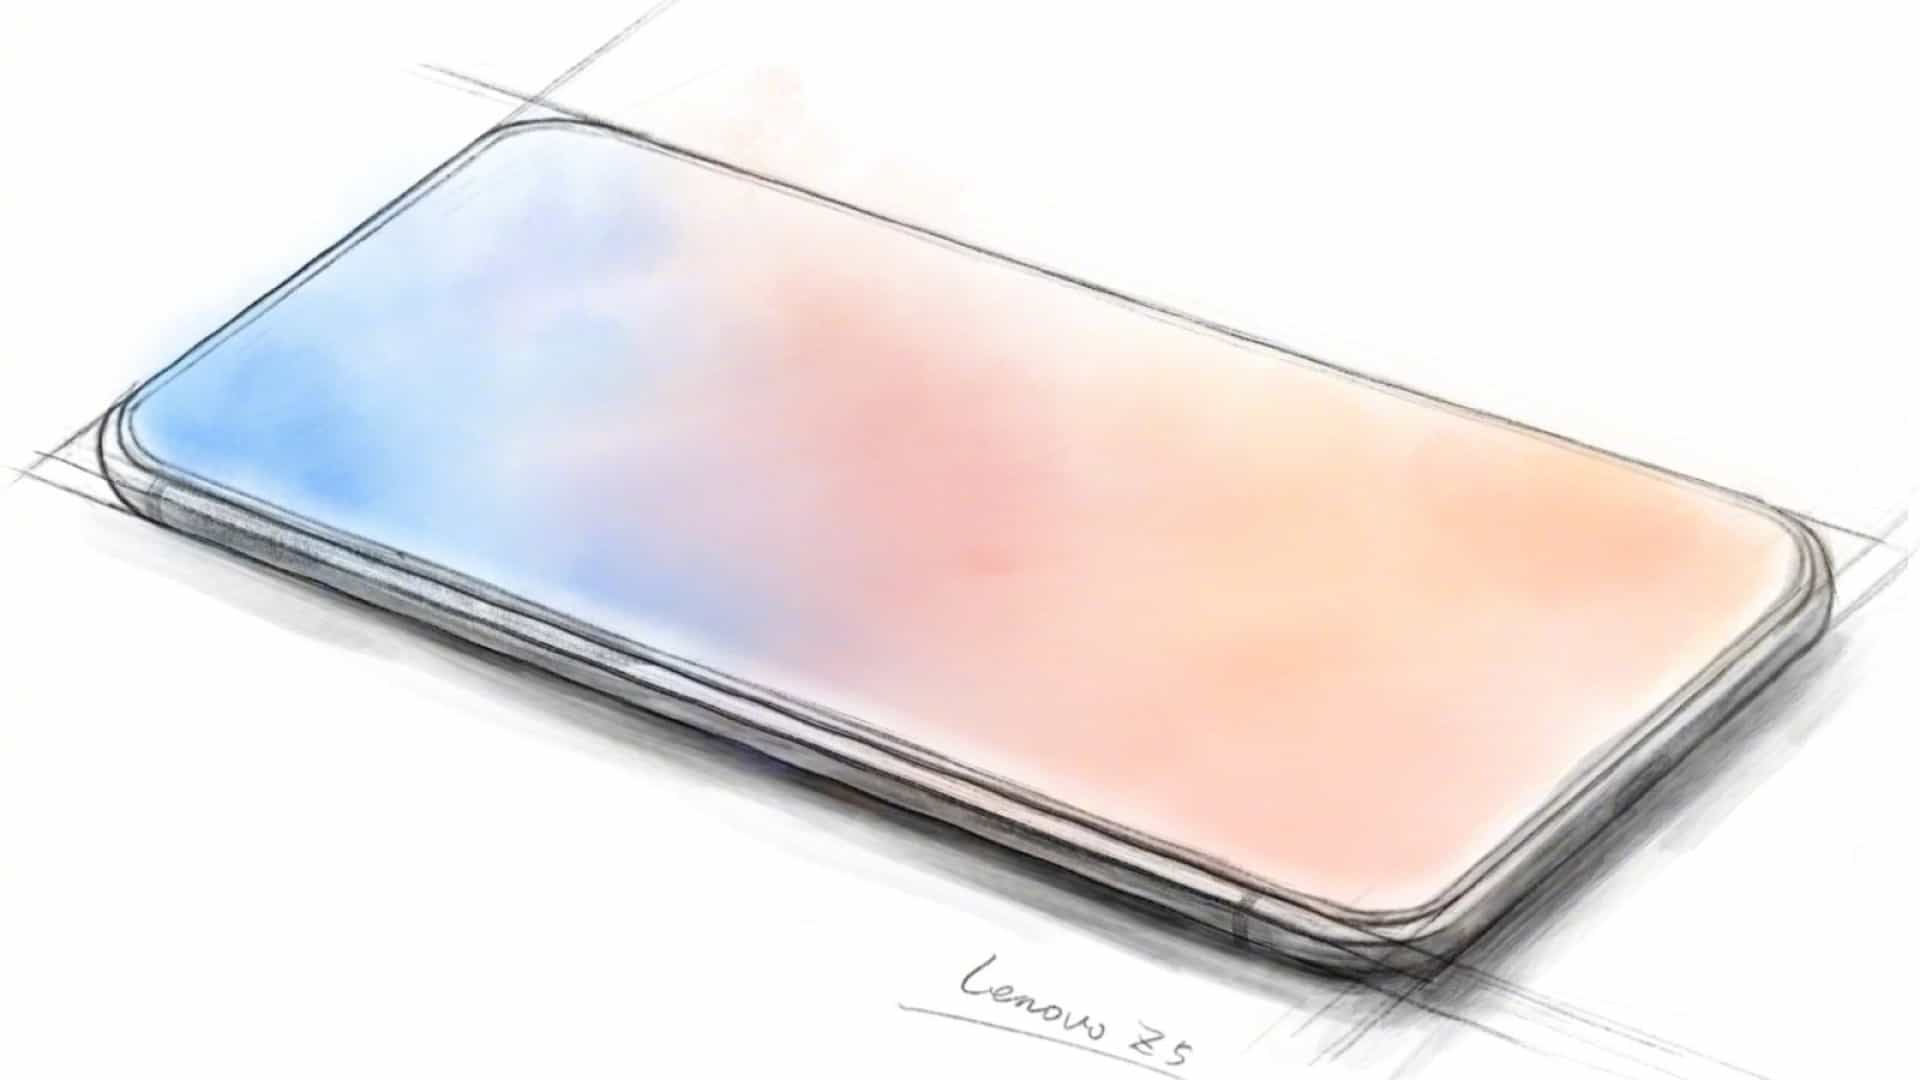 Rascunho pode ter revelado o novo smartphone da Lenovo